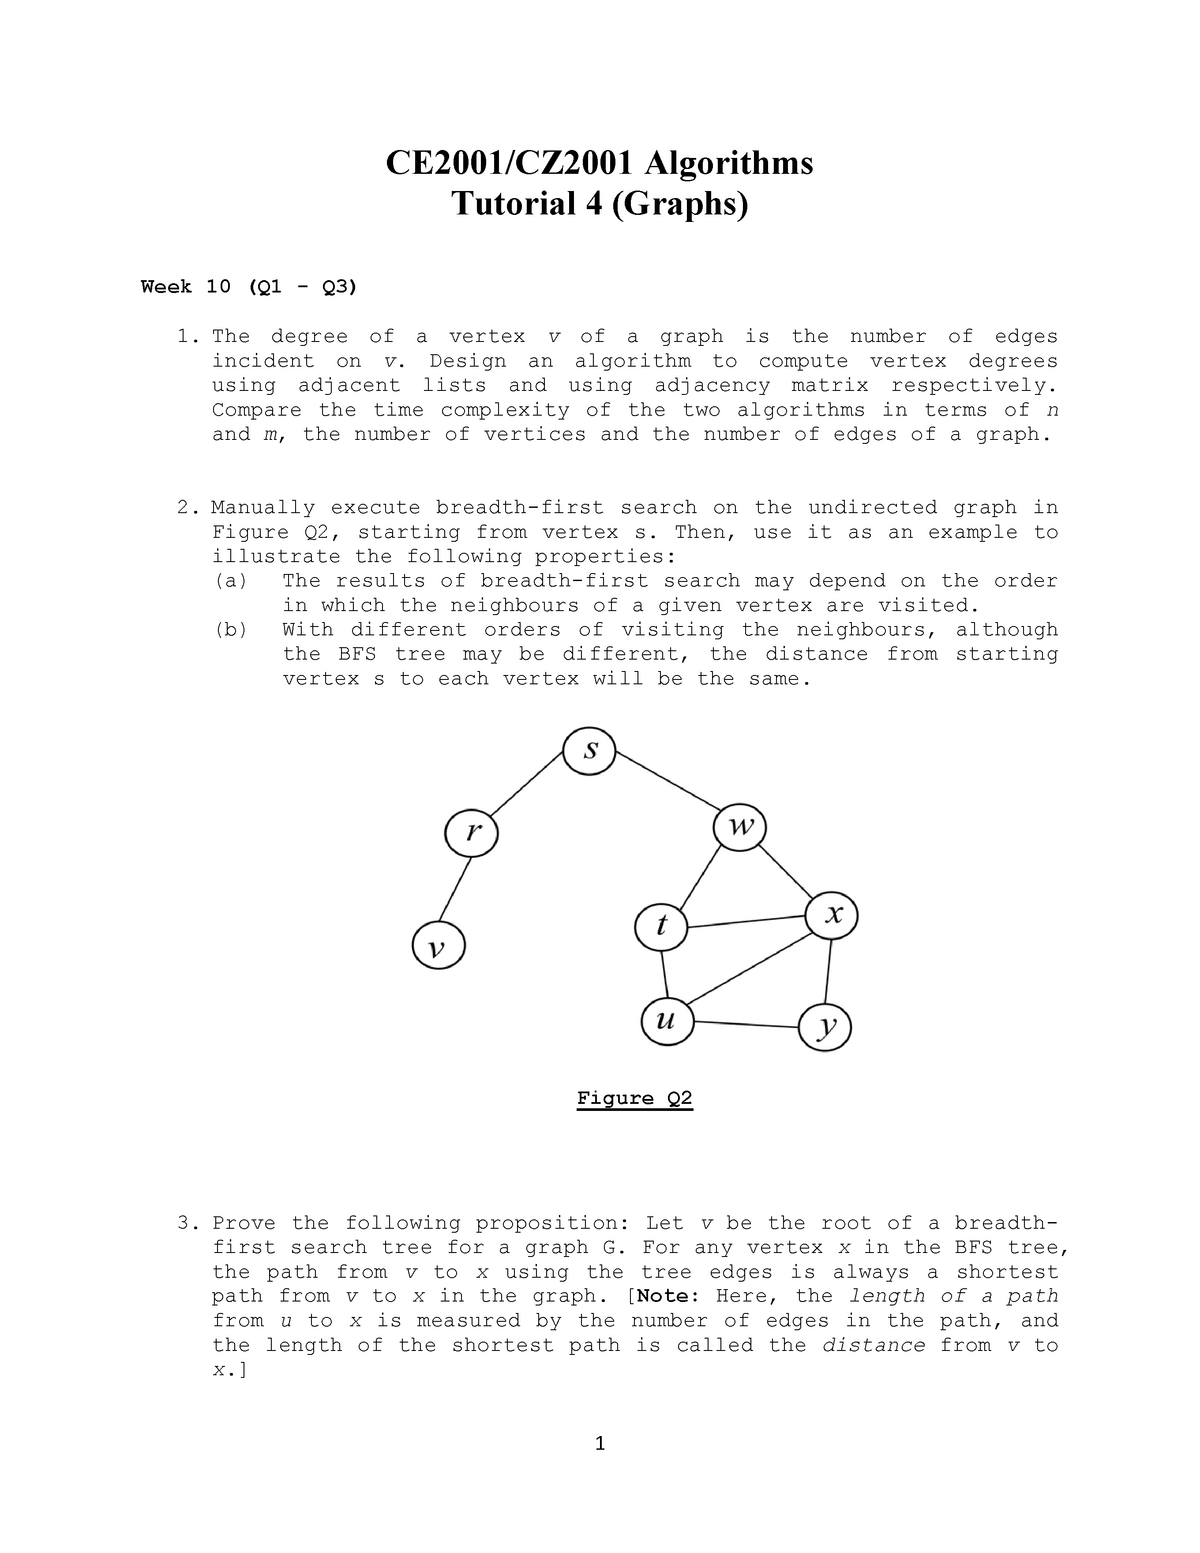 Tutorial 4 (Sorting) - CZ2001: Algorithms - StuDocu